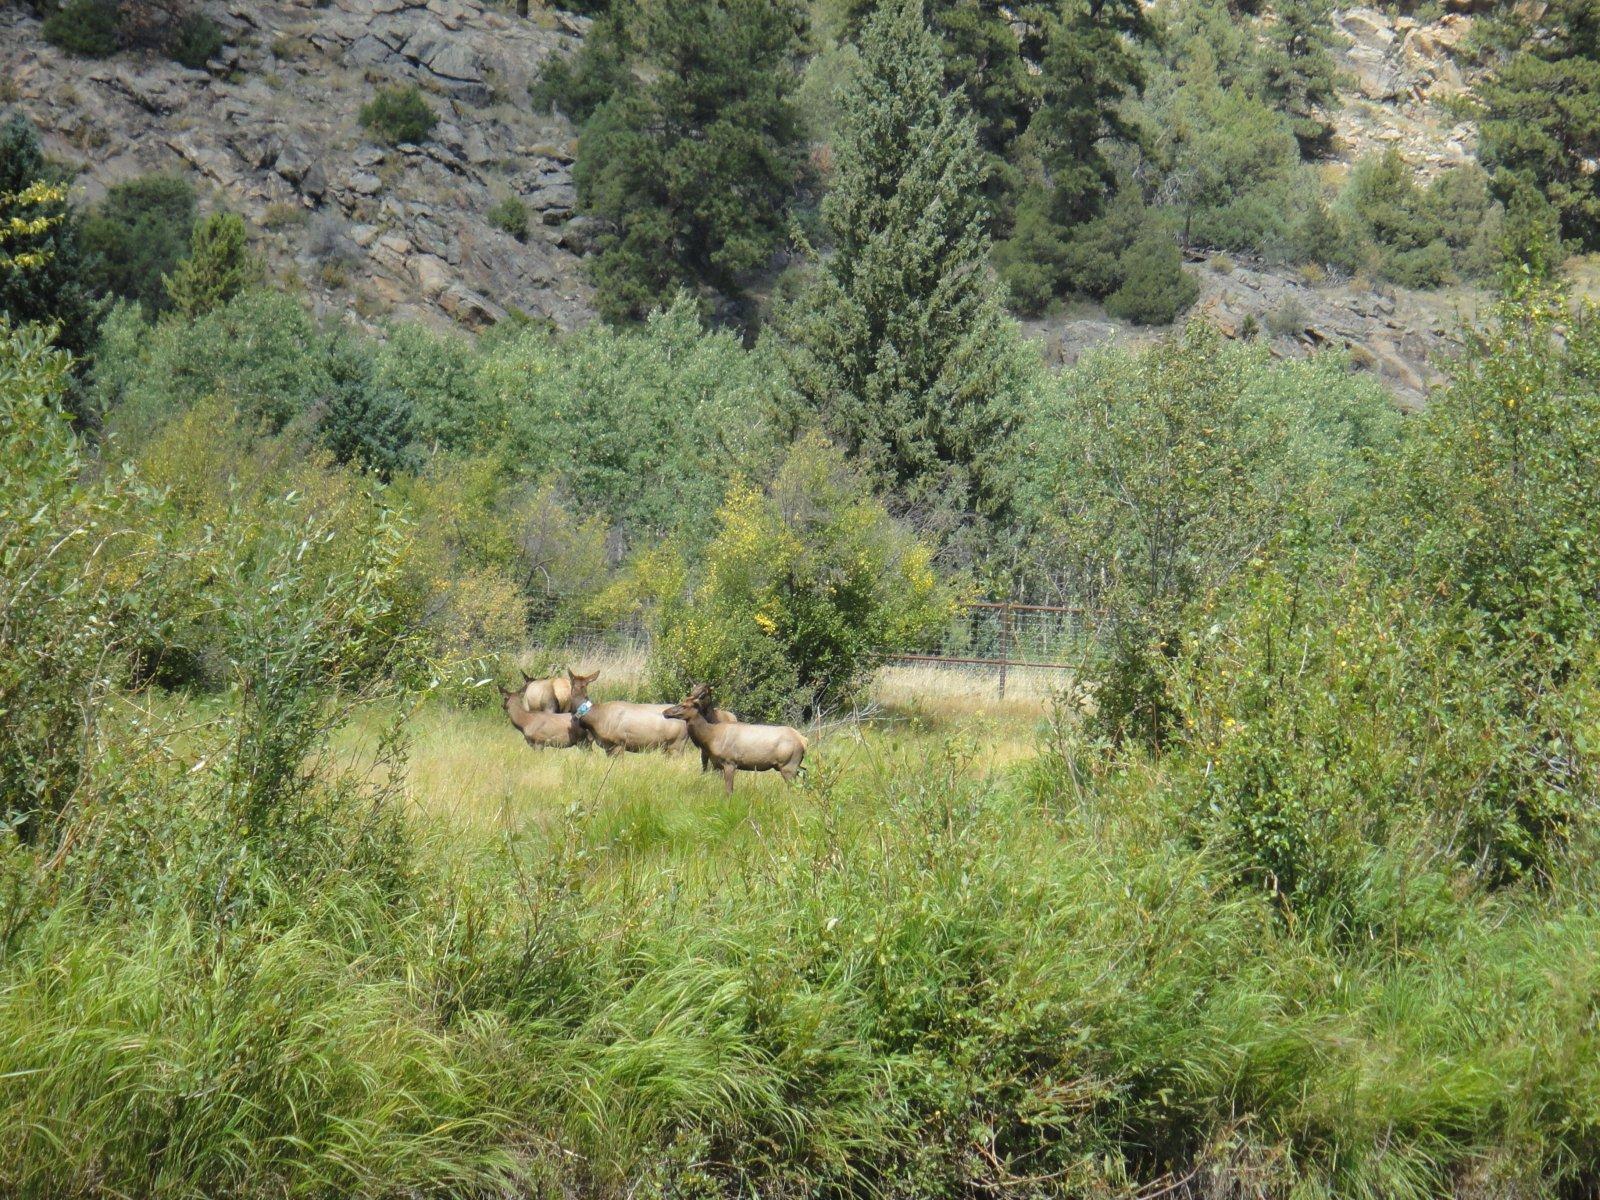 Click image for larger version  Name:Elk.jpg Views:123 Size:635.9 KB ID:167124